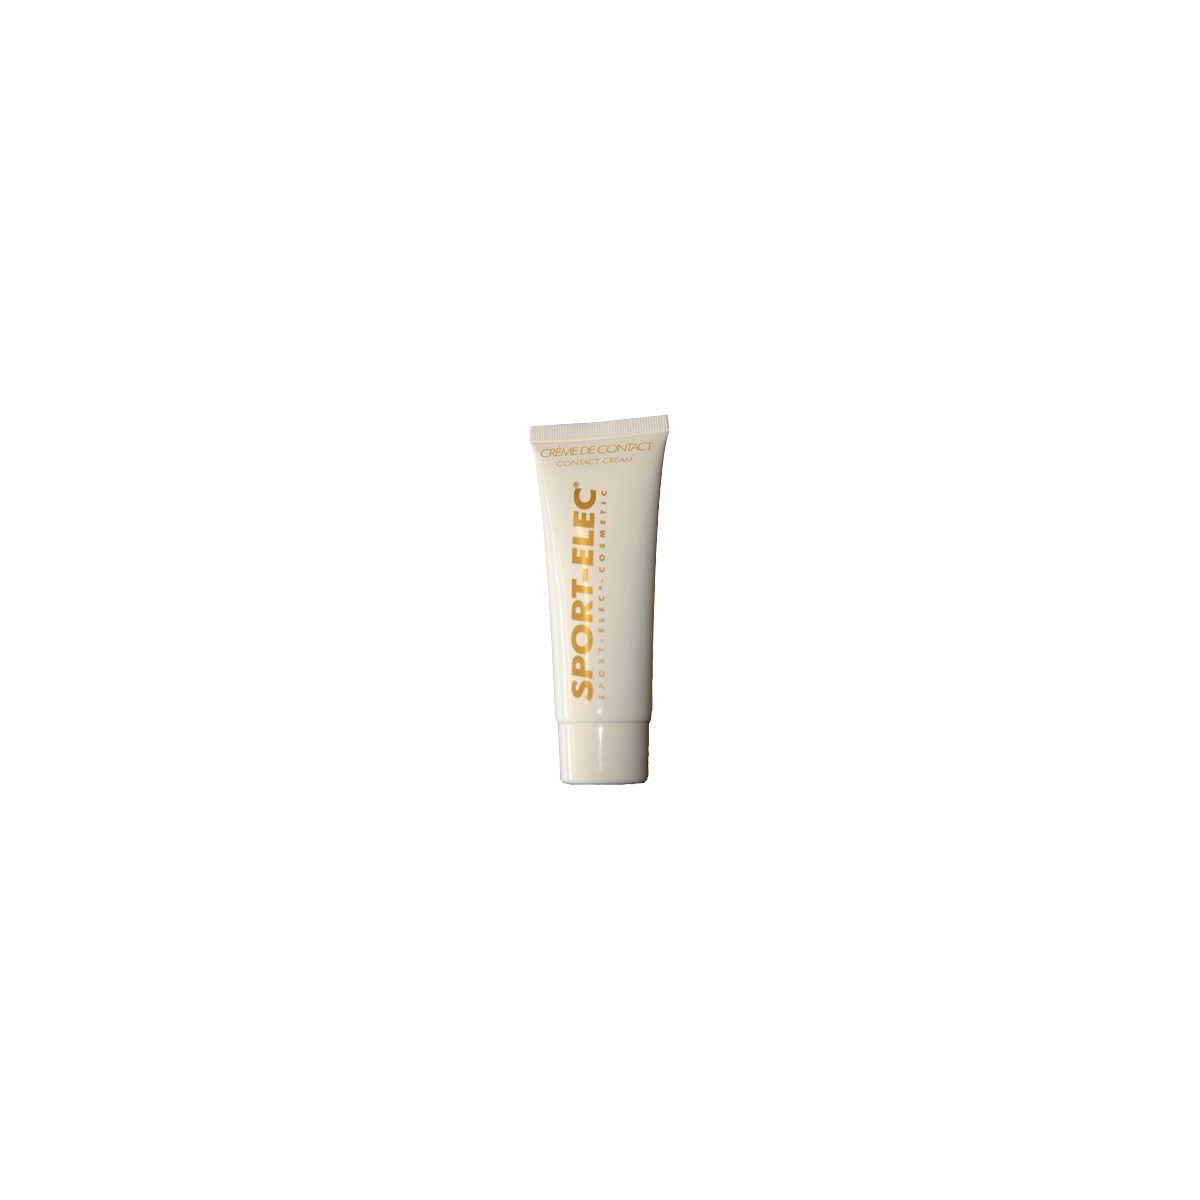 Crème SPORT ELEC silhouette 75 ML